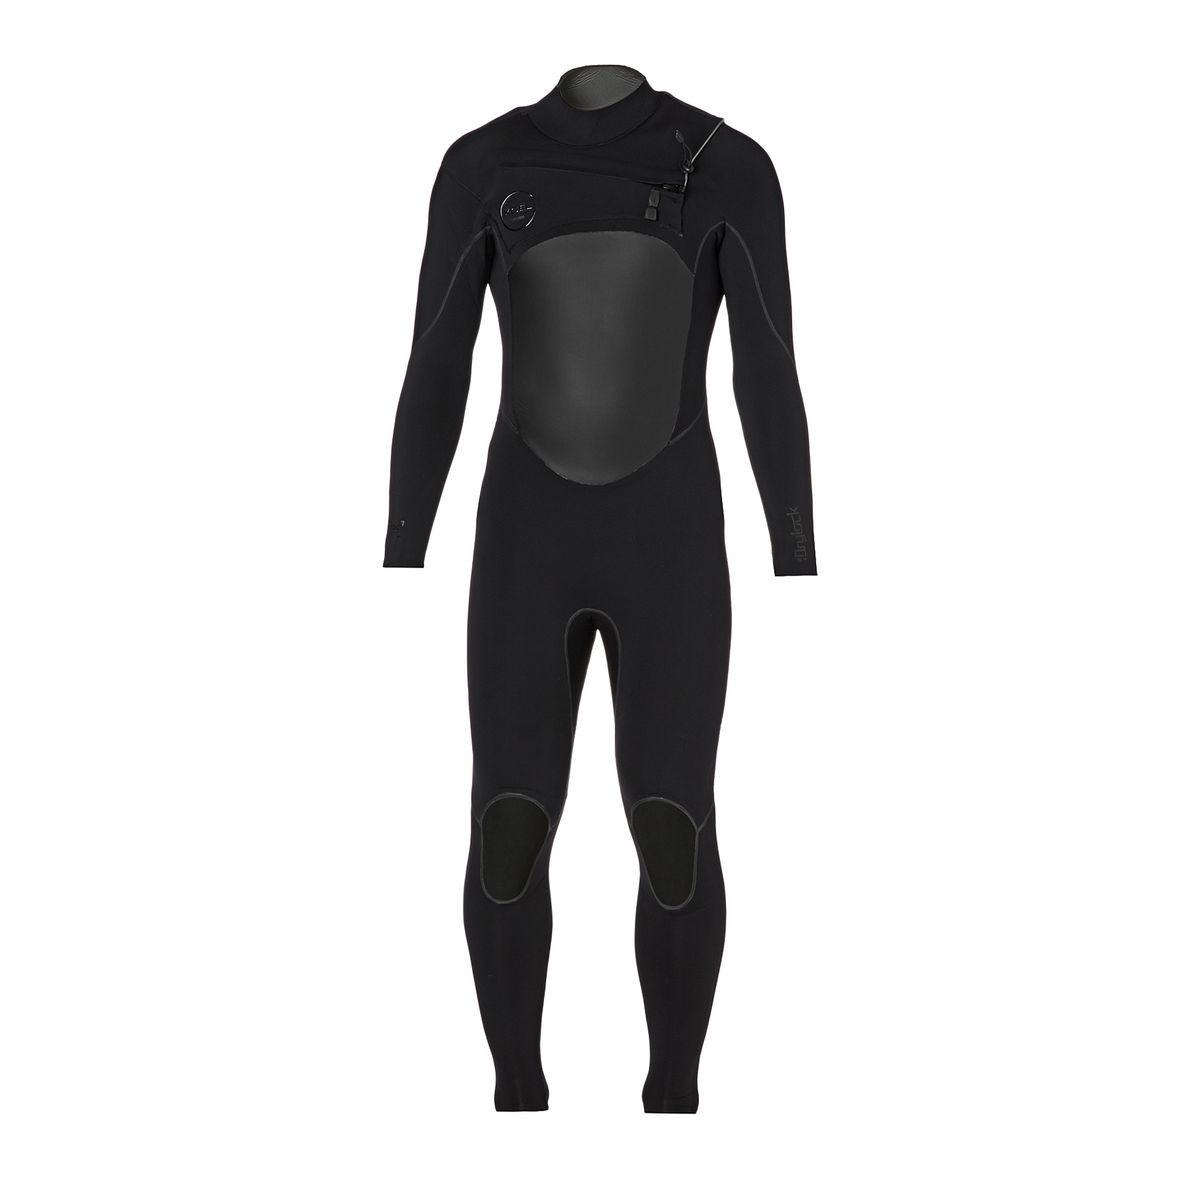 Xcel Drylock 5/4mm 2017 TDC Chest Zip Wetsuit - Black